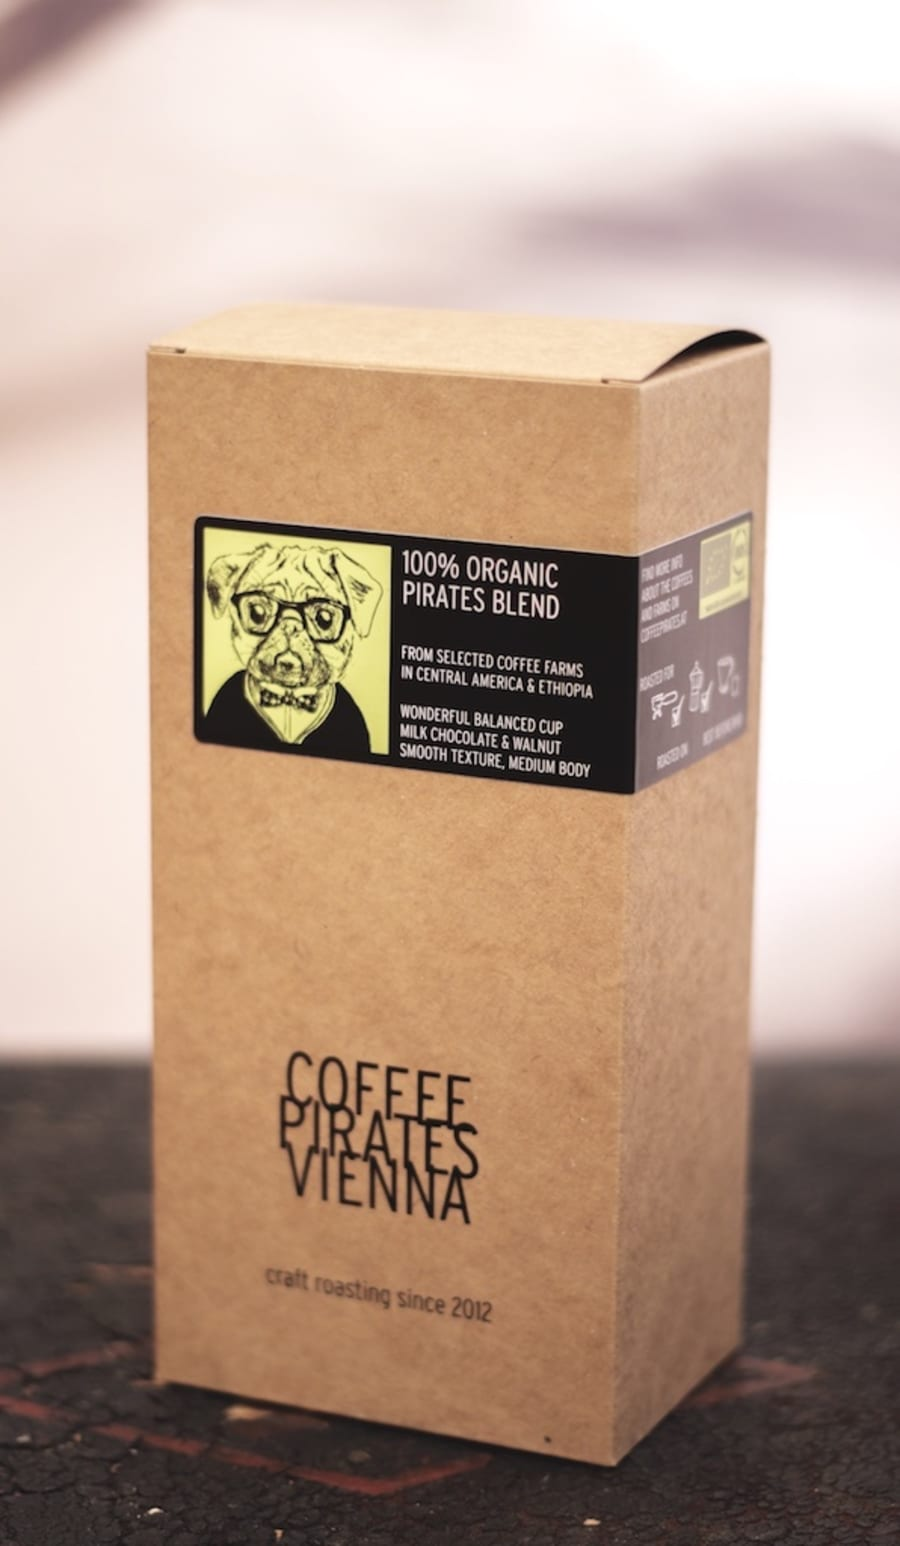 PIRATES BLEND   CoffeePirates Vienna Coffee Roasters